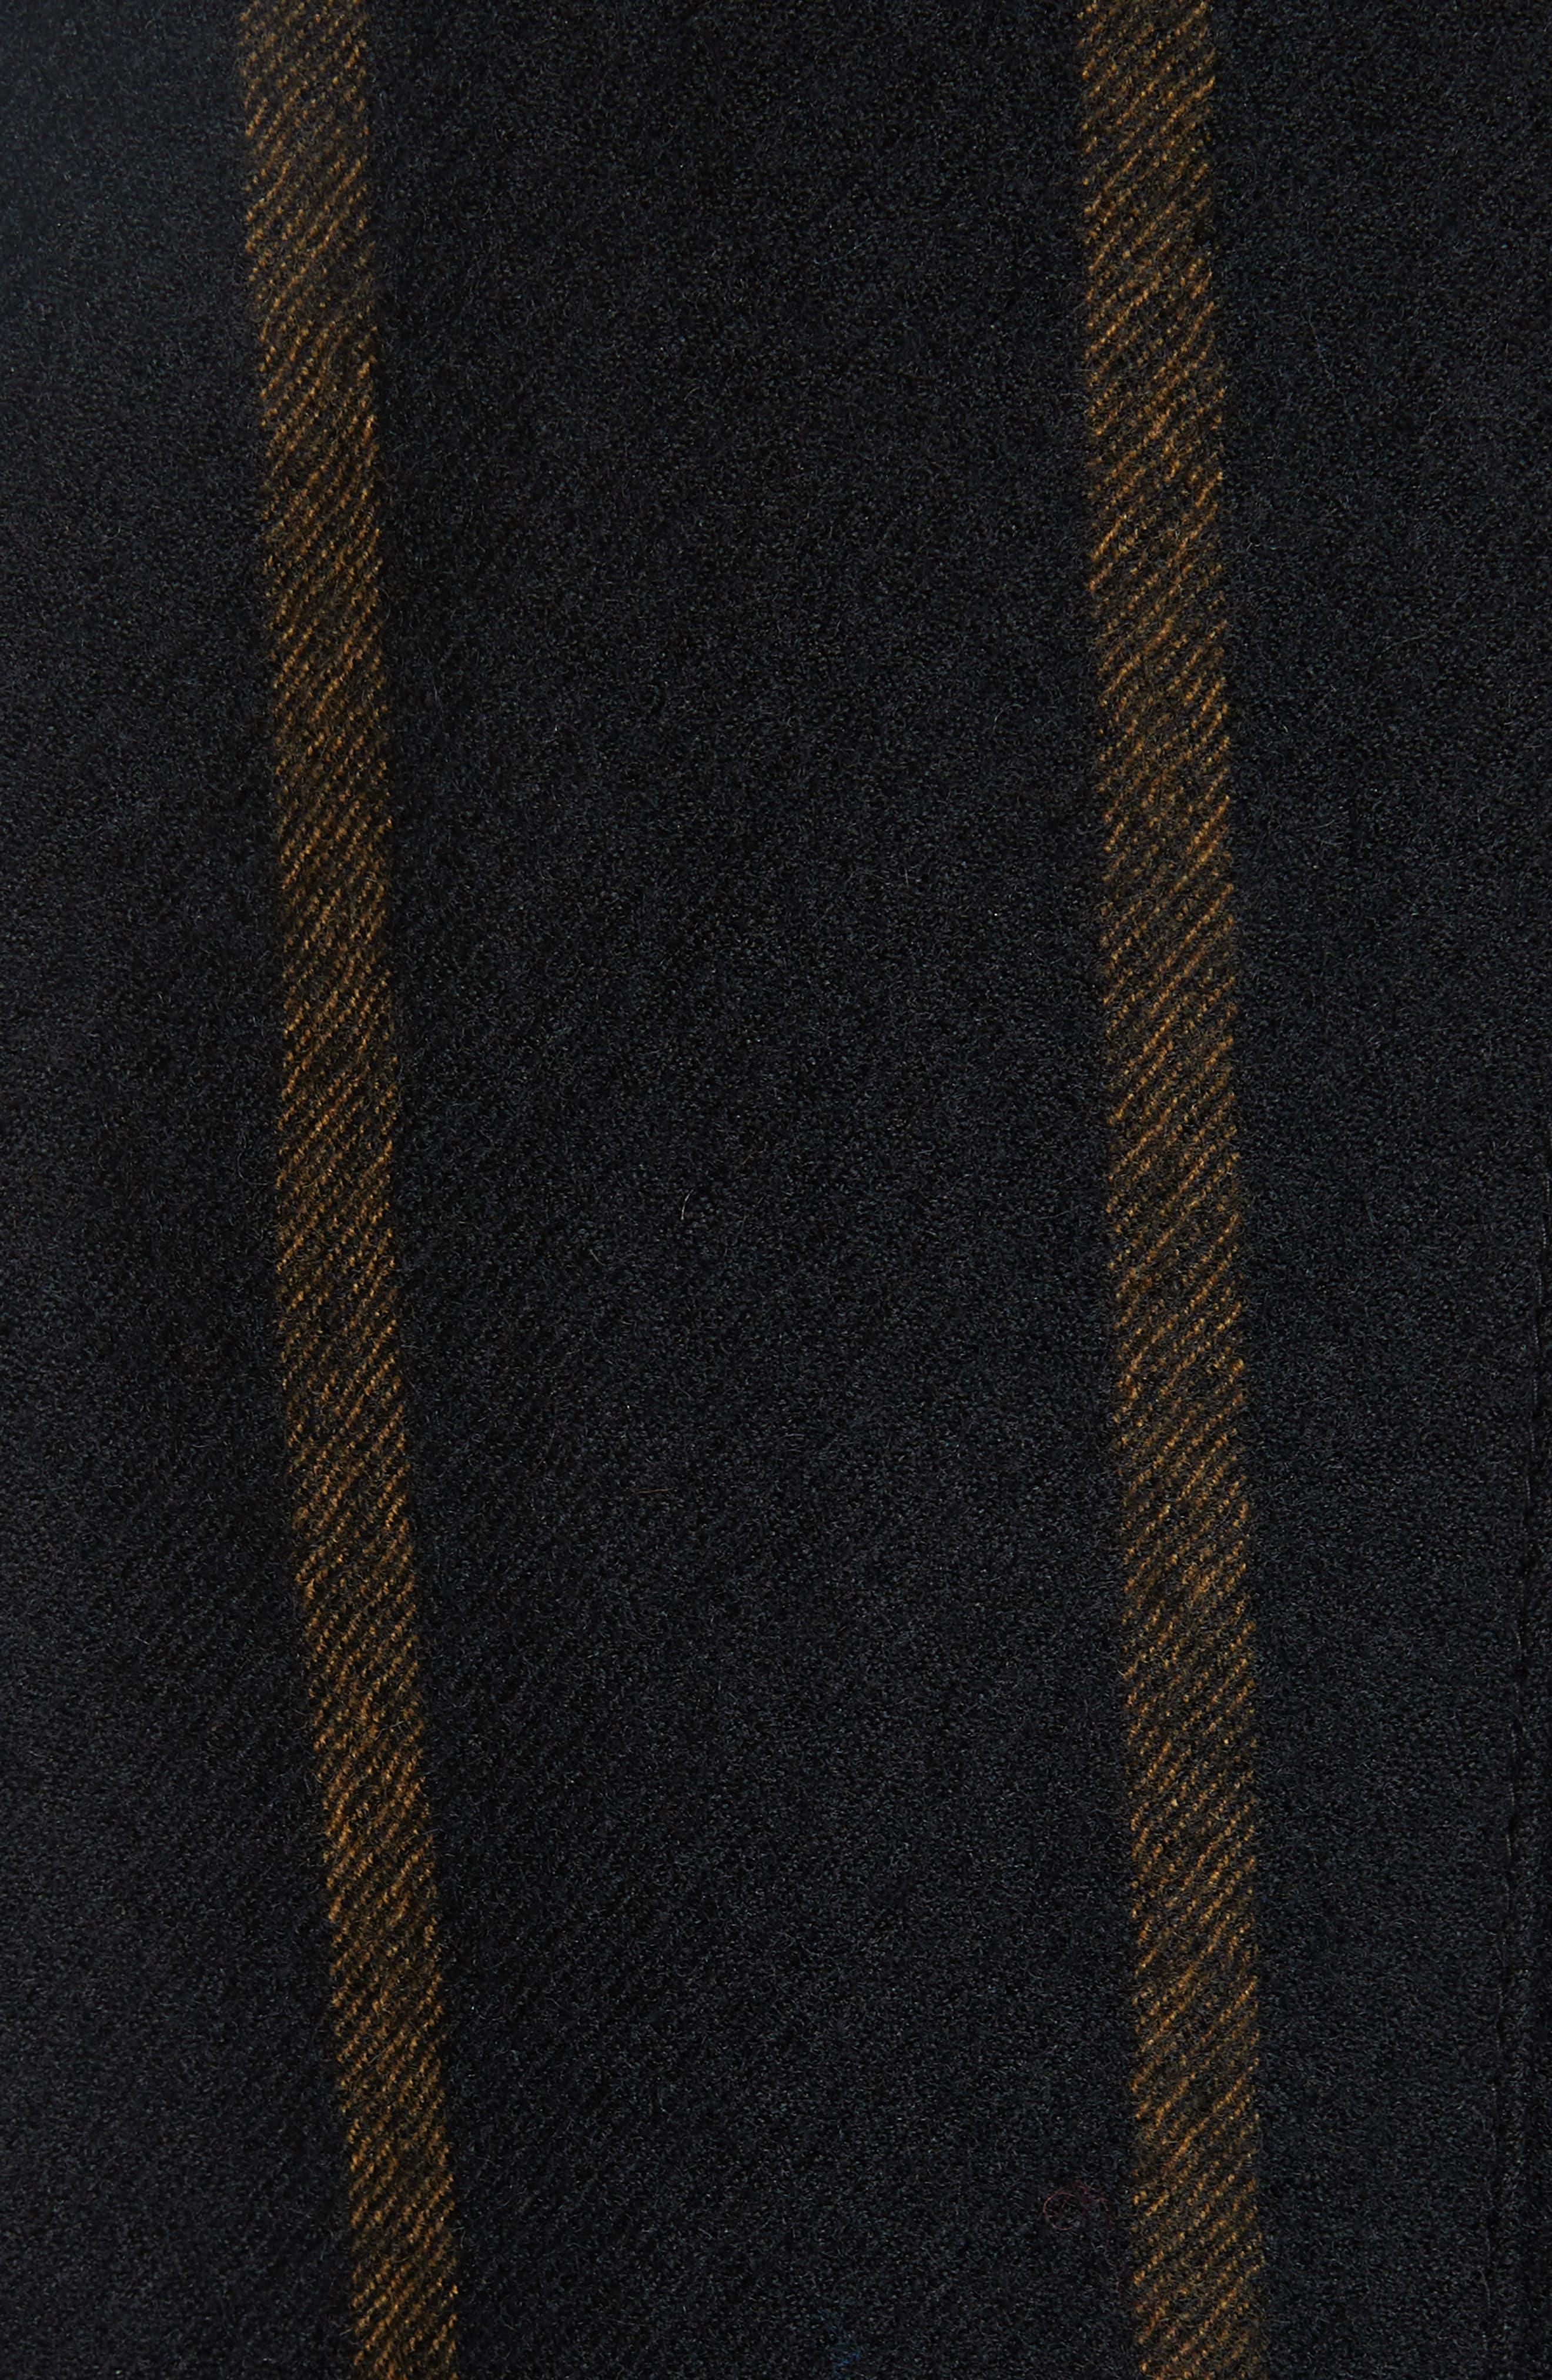 Stripe Peak Lapel Wool Blazer,                             Alternate thumbnail 6, color,                             002